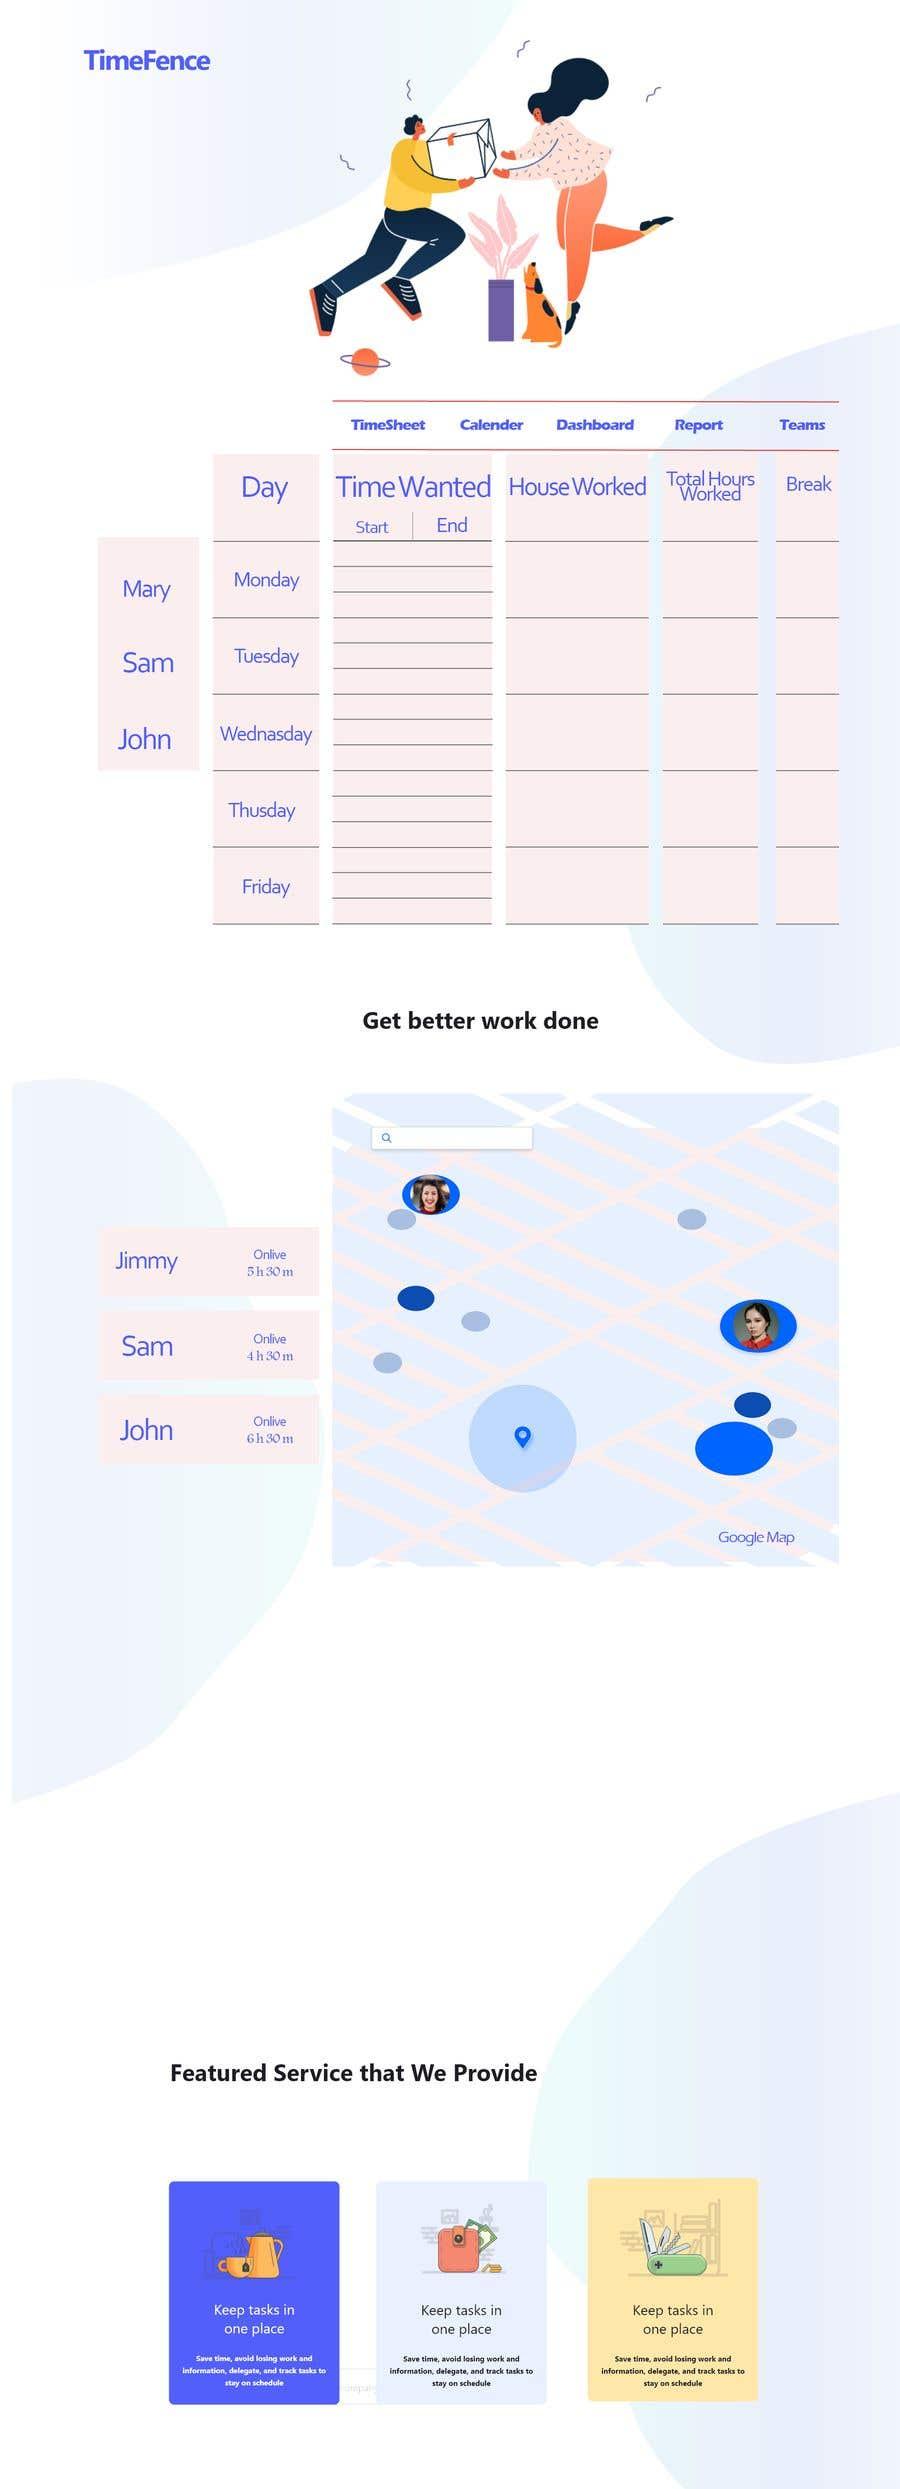 Konkurrenceindlæg #                                        8                                      for                                         Build me a stunning Website/Portal (Looking for UI experts)